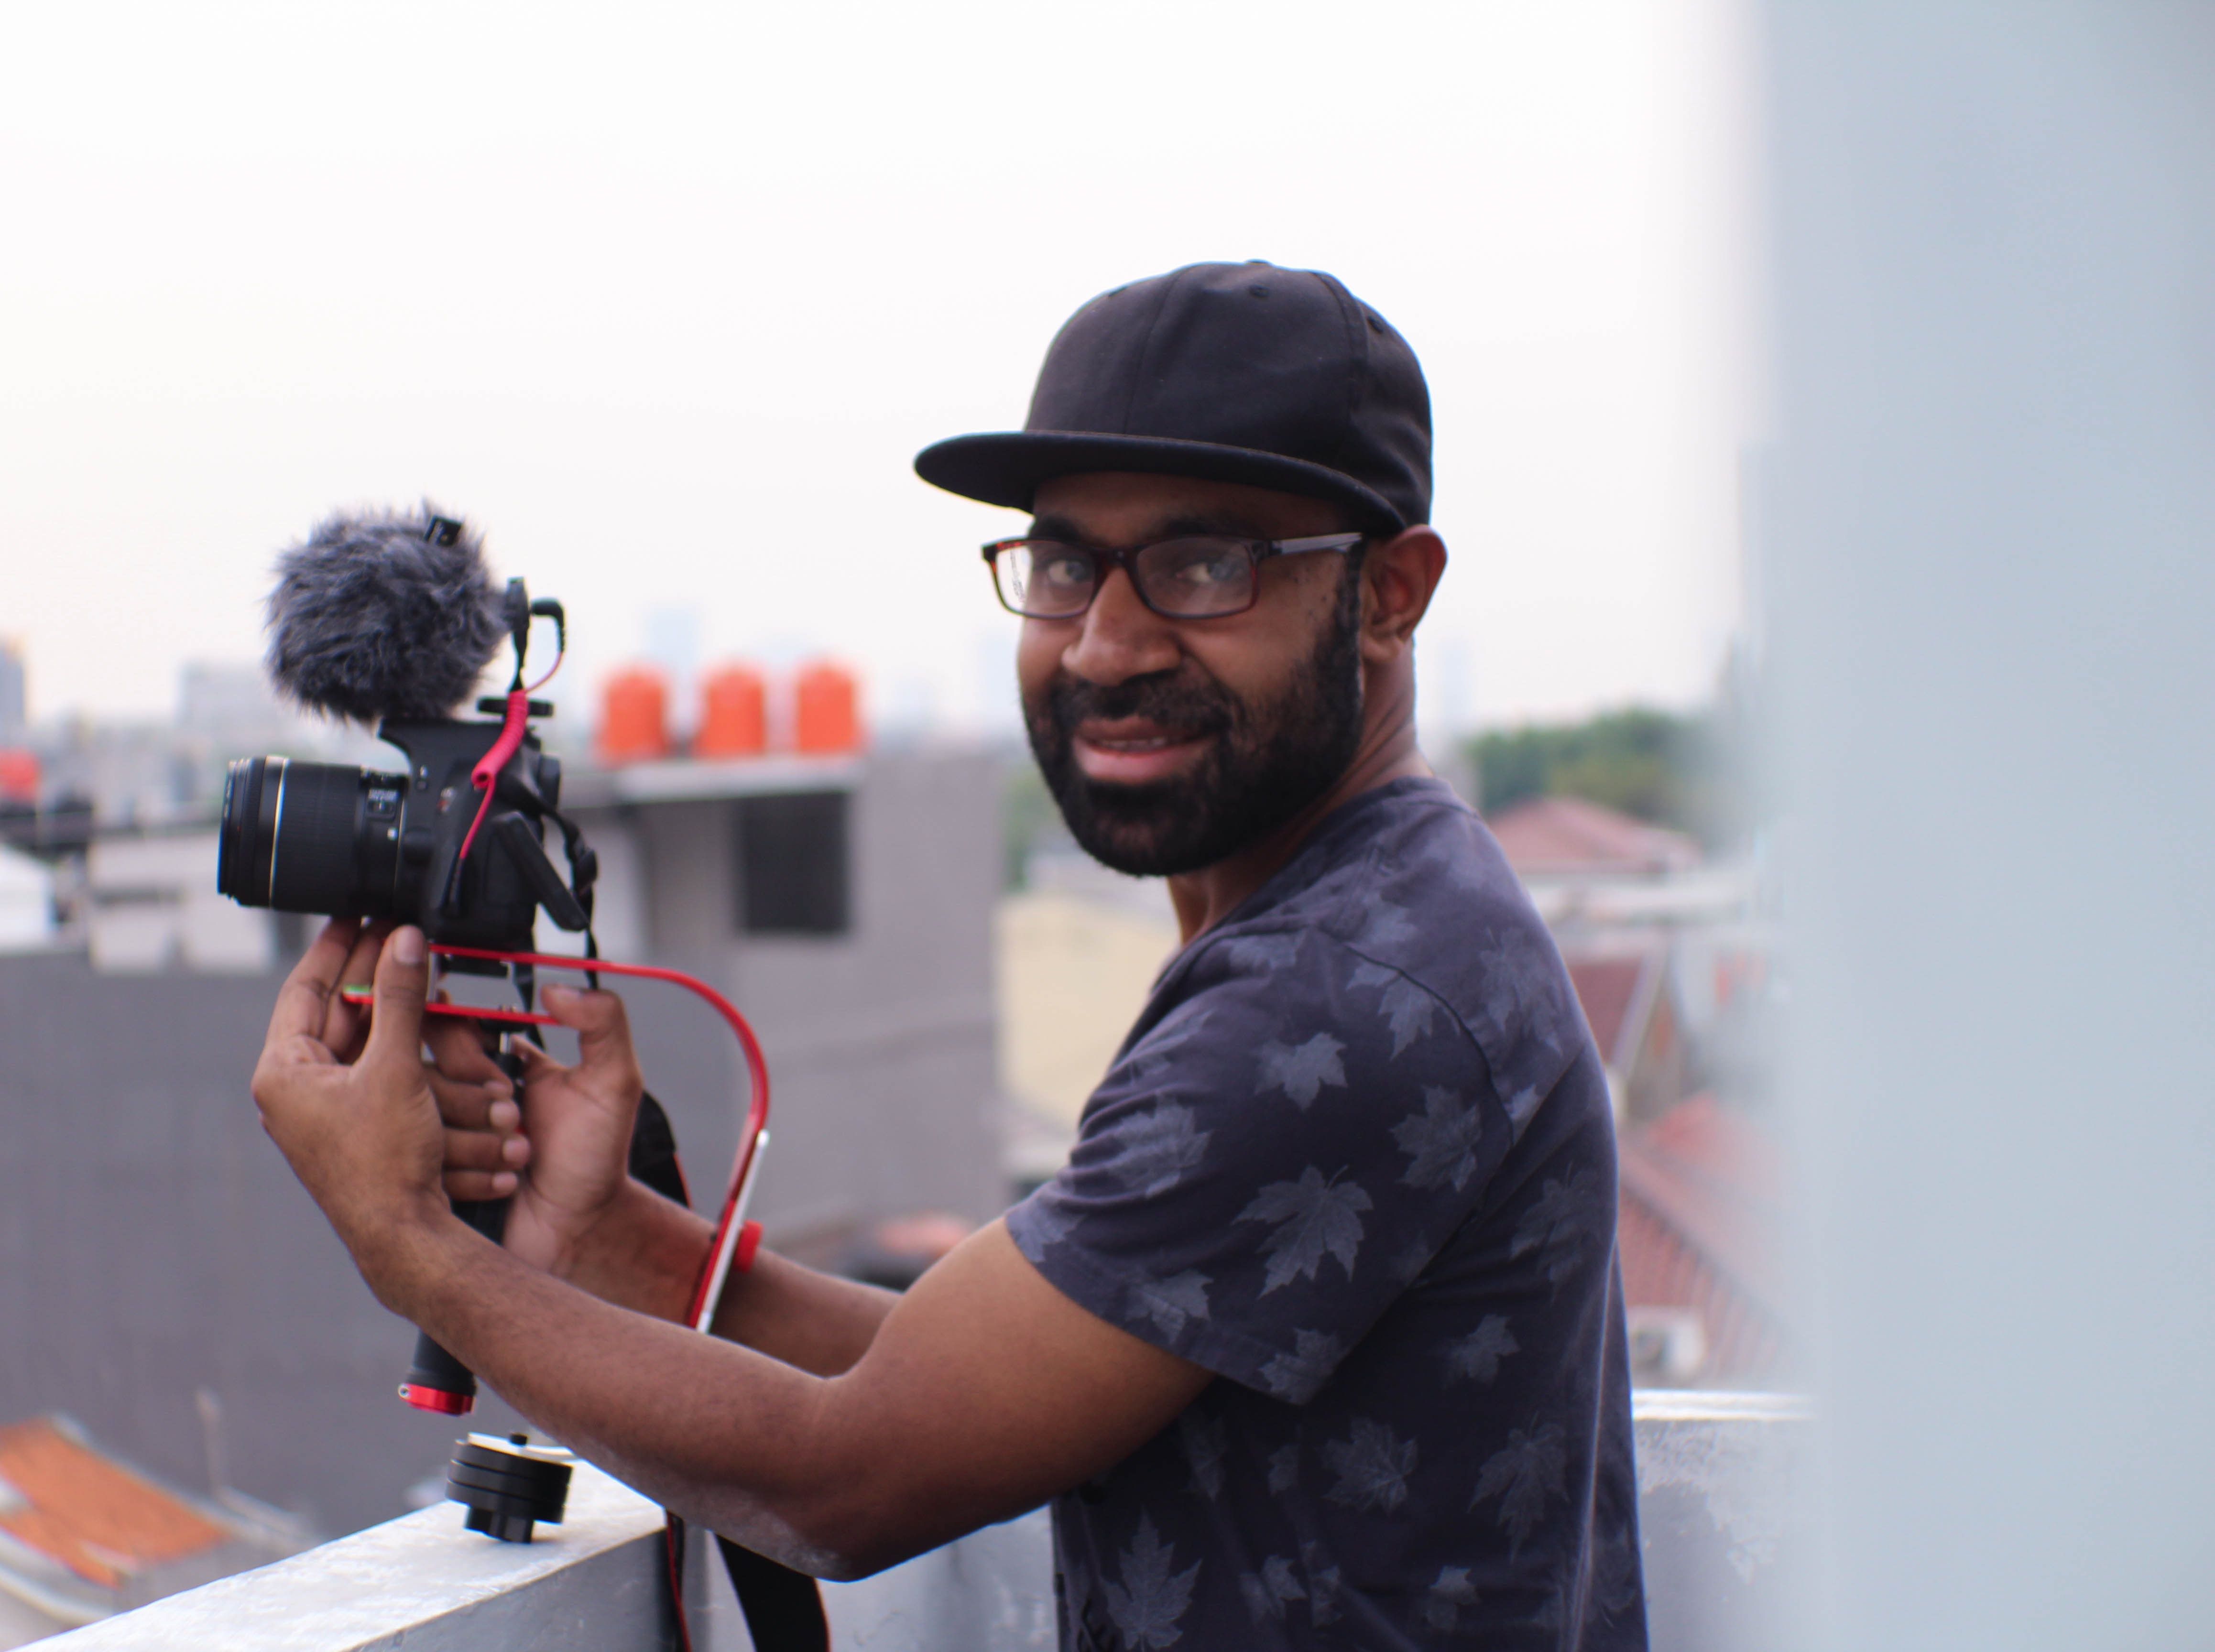 man holding camera beside terrace rail